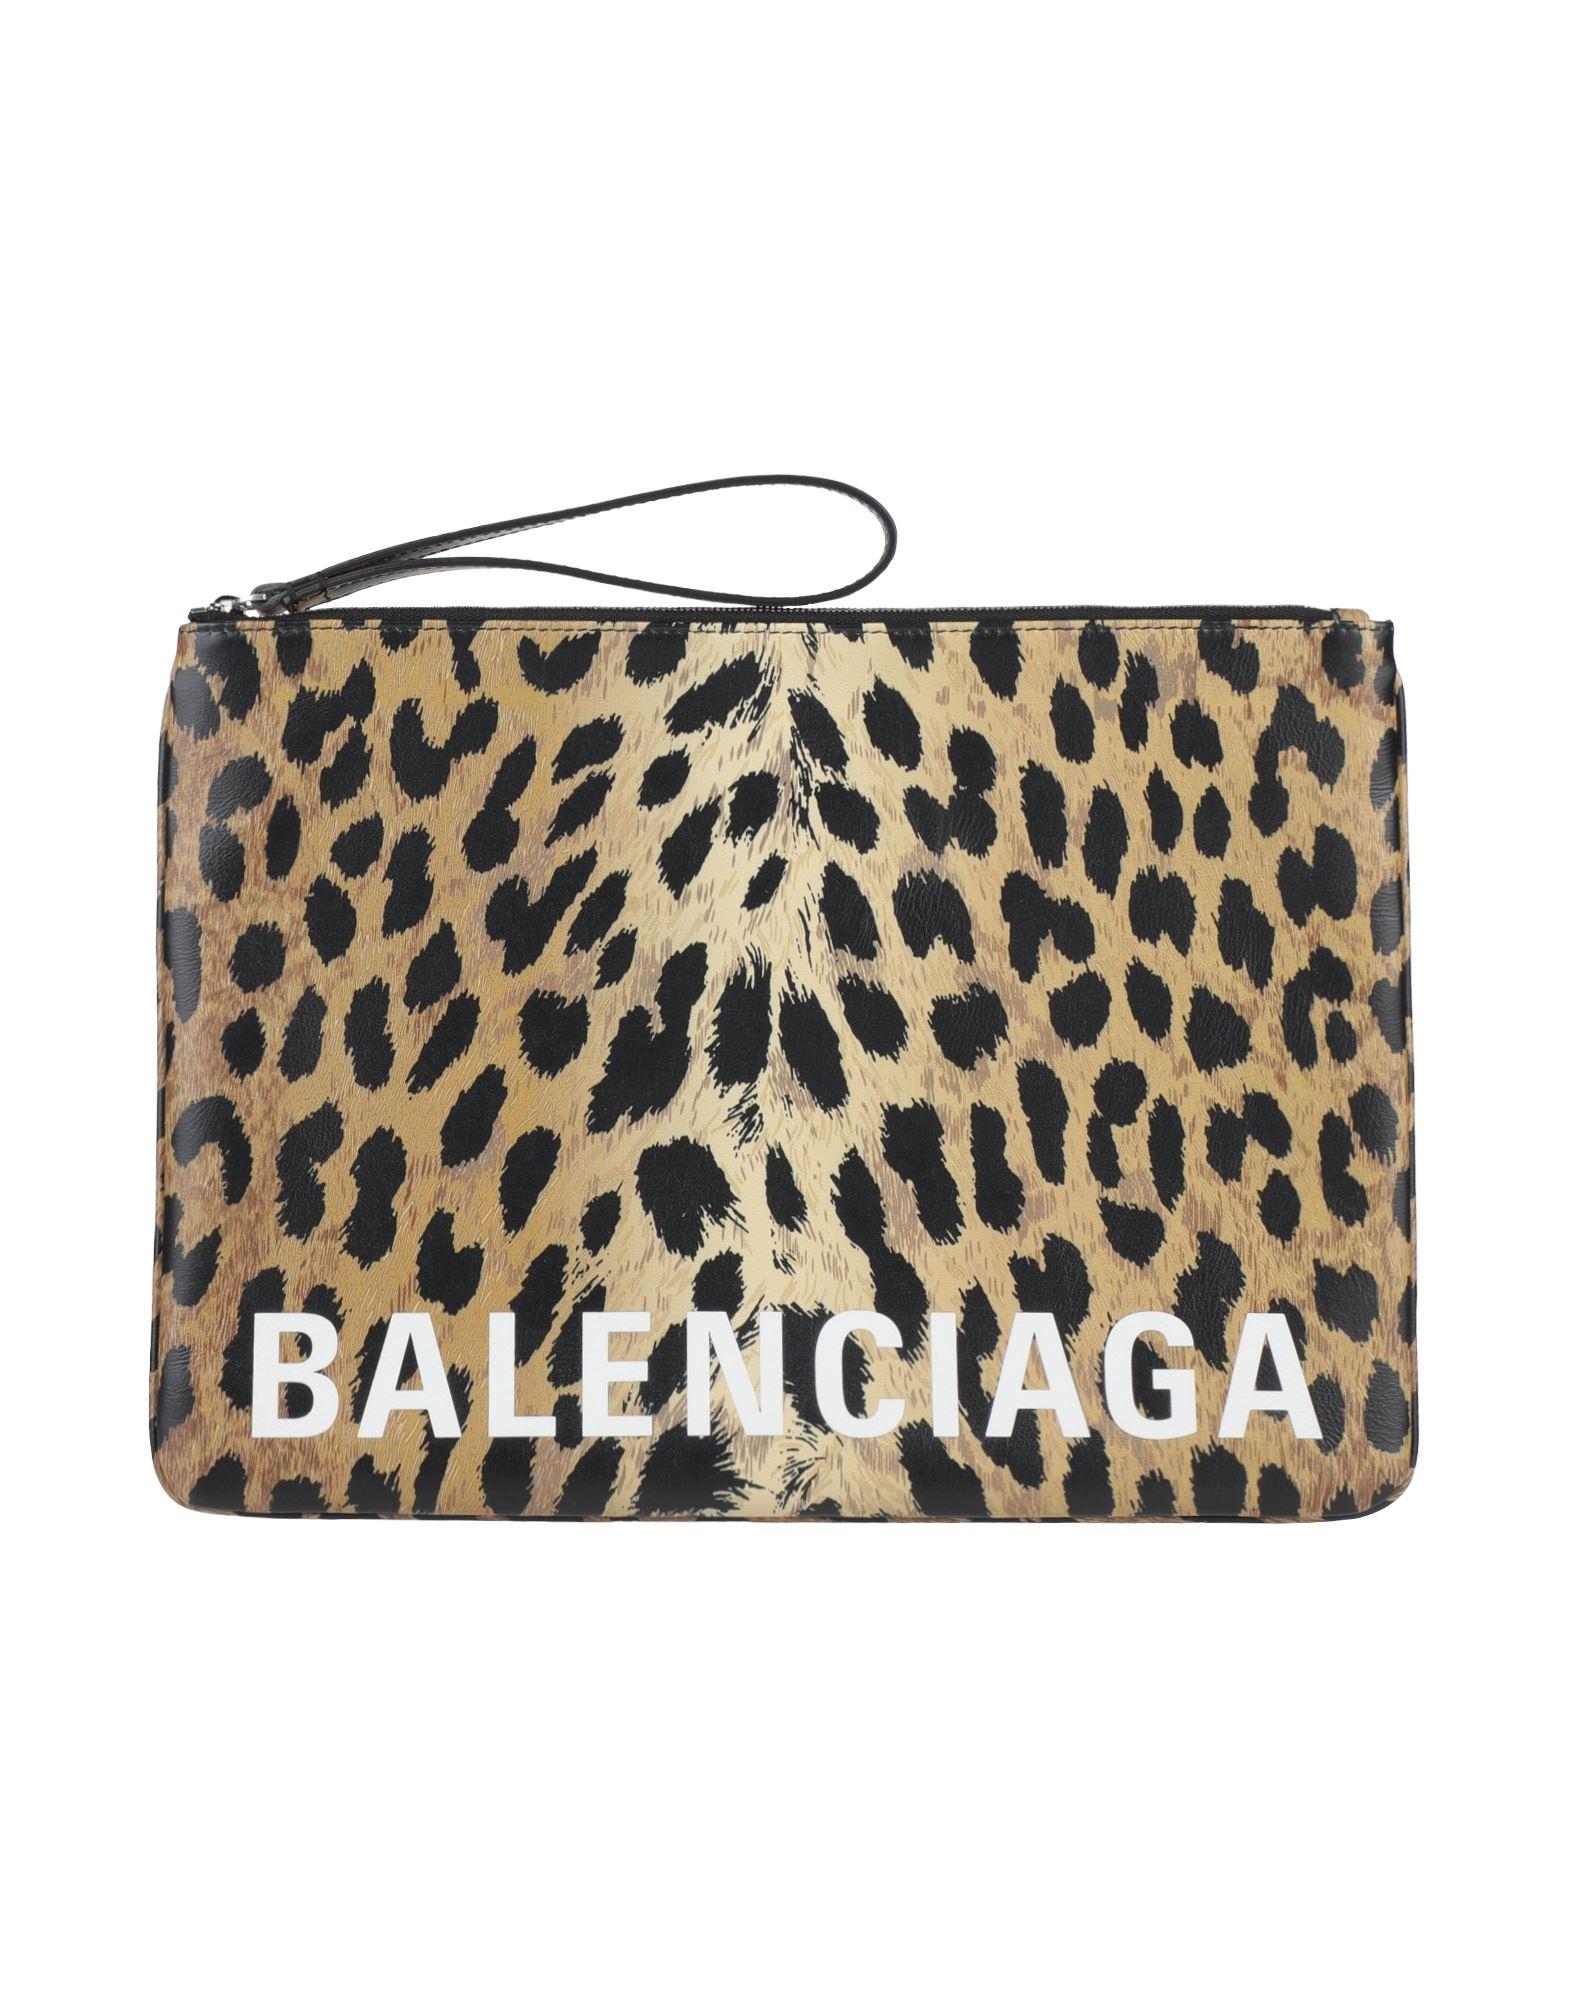 BALENCIAGA Handbags - Item 45557591